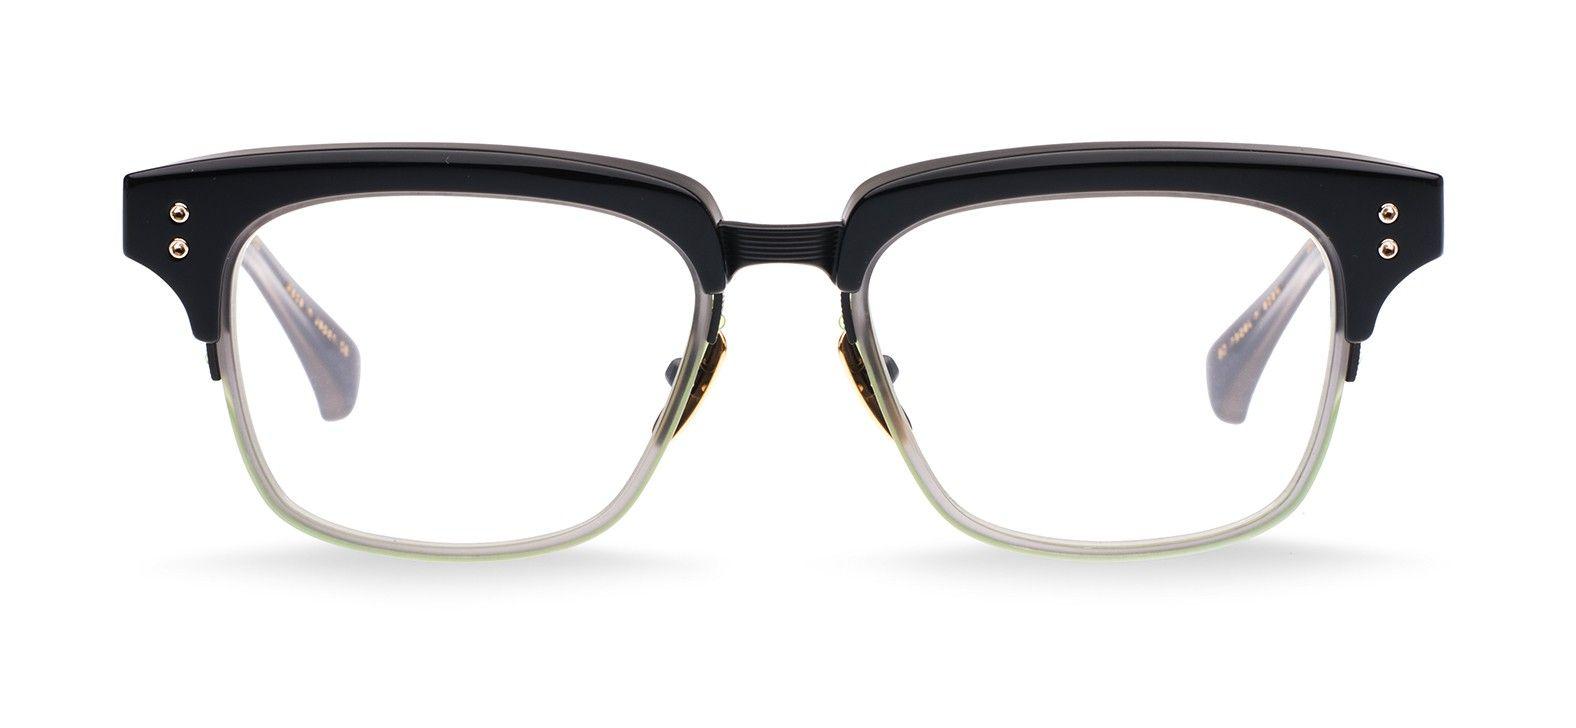 77d068285263 The STATESMAN-FIVE men s vintage optical glasses by DITA Eyewear ...